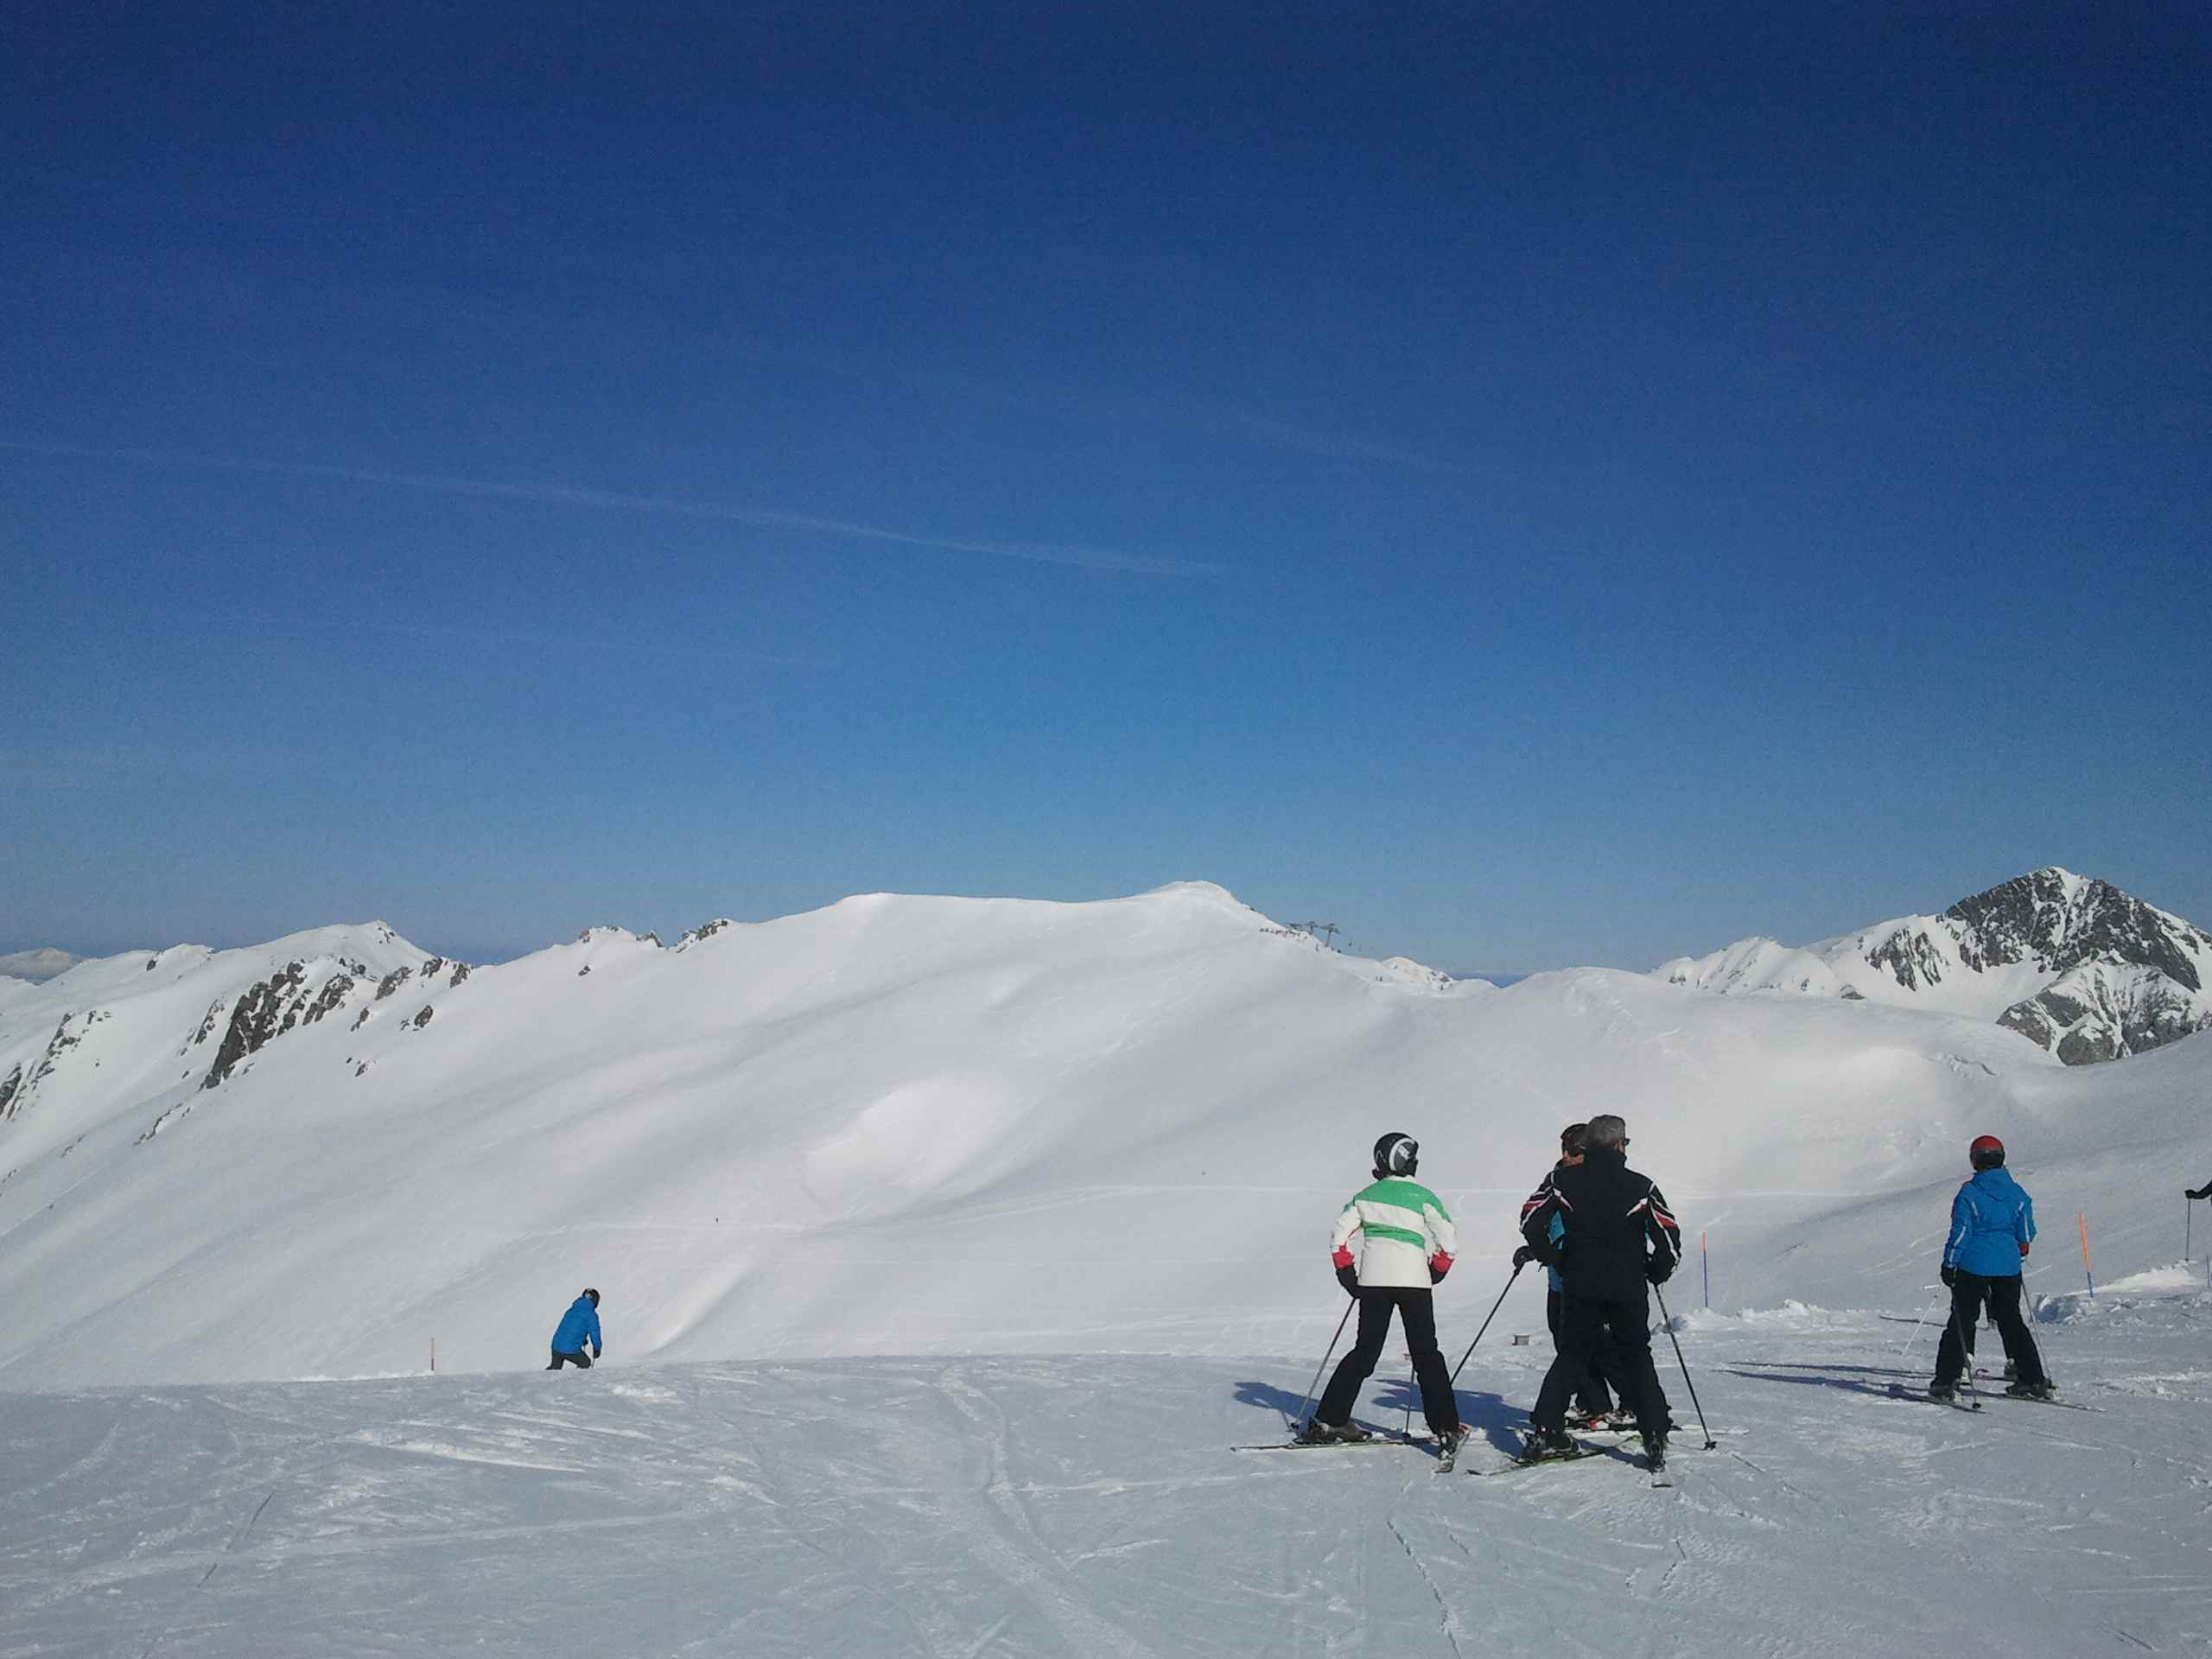 Skiing at San Isidro, Leon, Spain